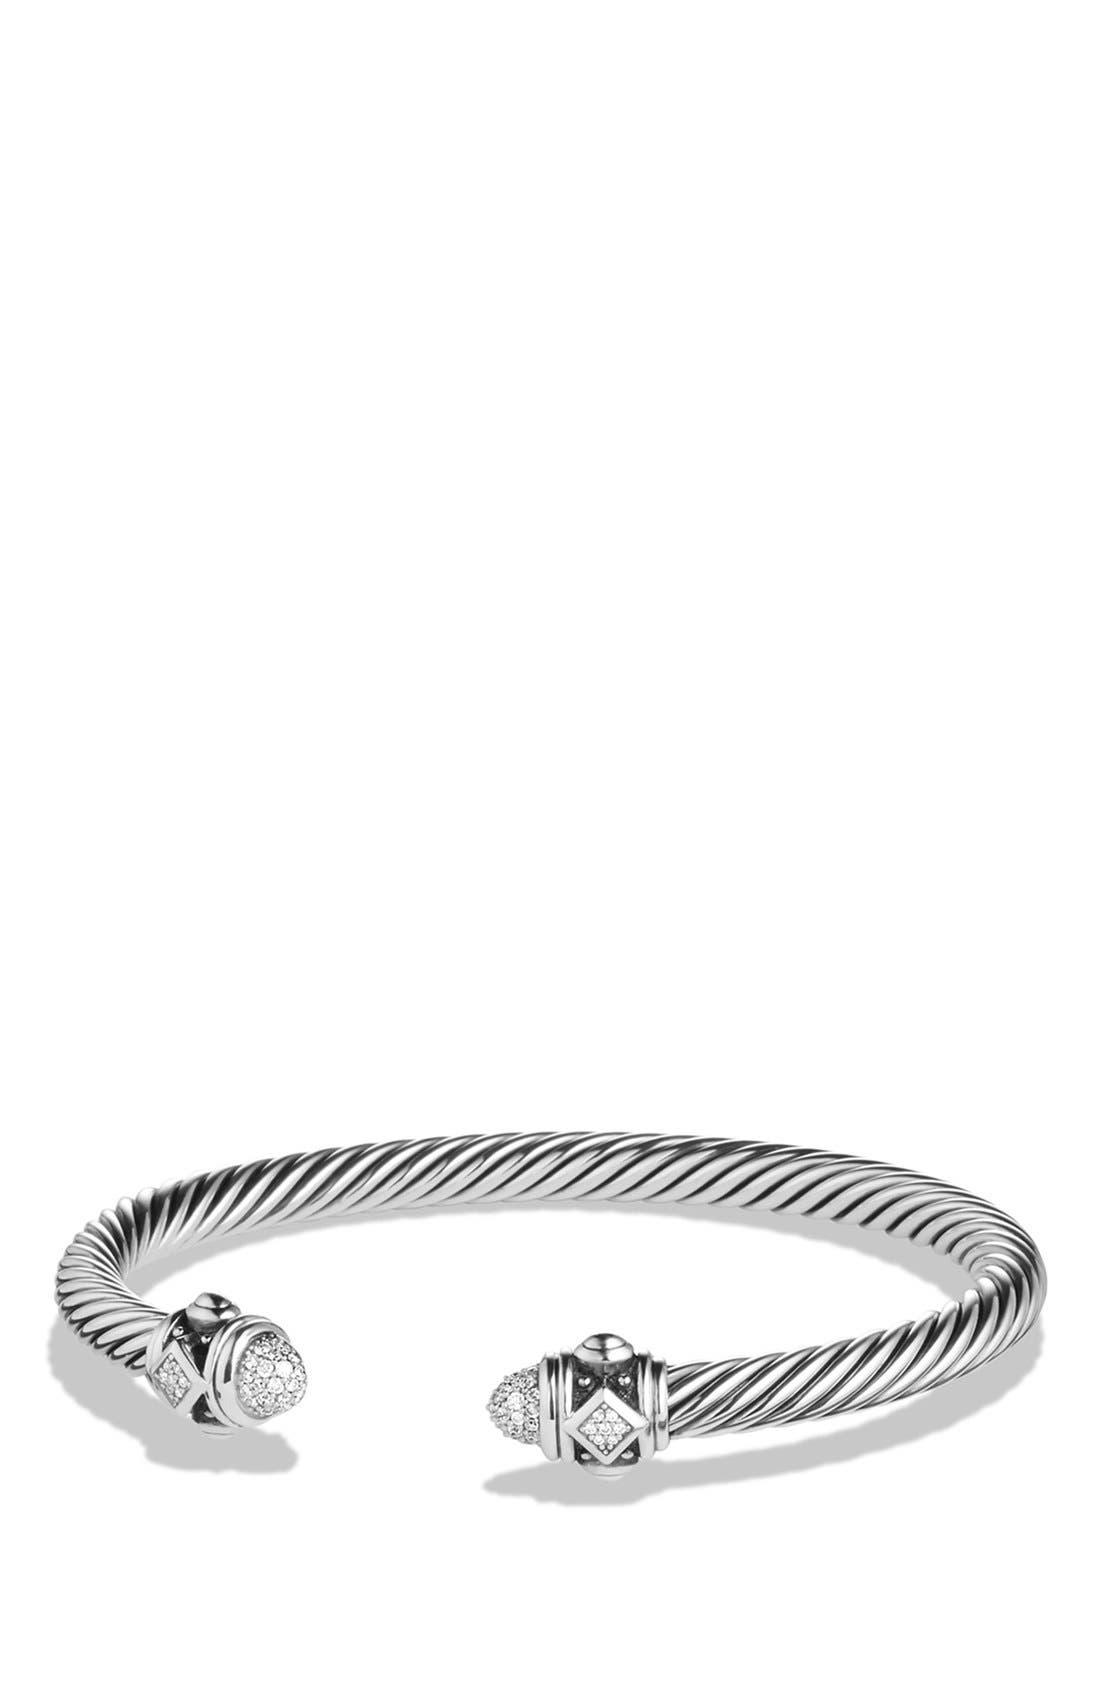 David Yurman 'Renaissance' Bracelet with Diamonds in Silver